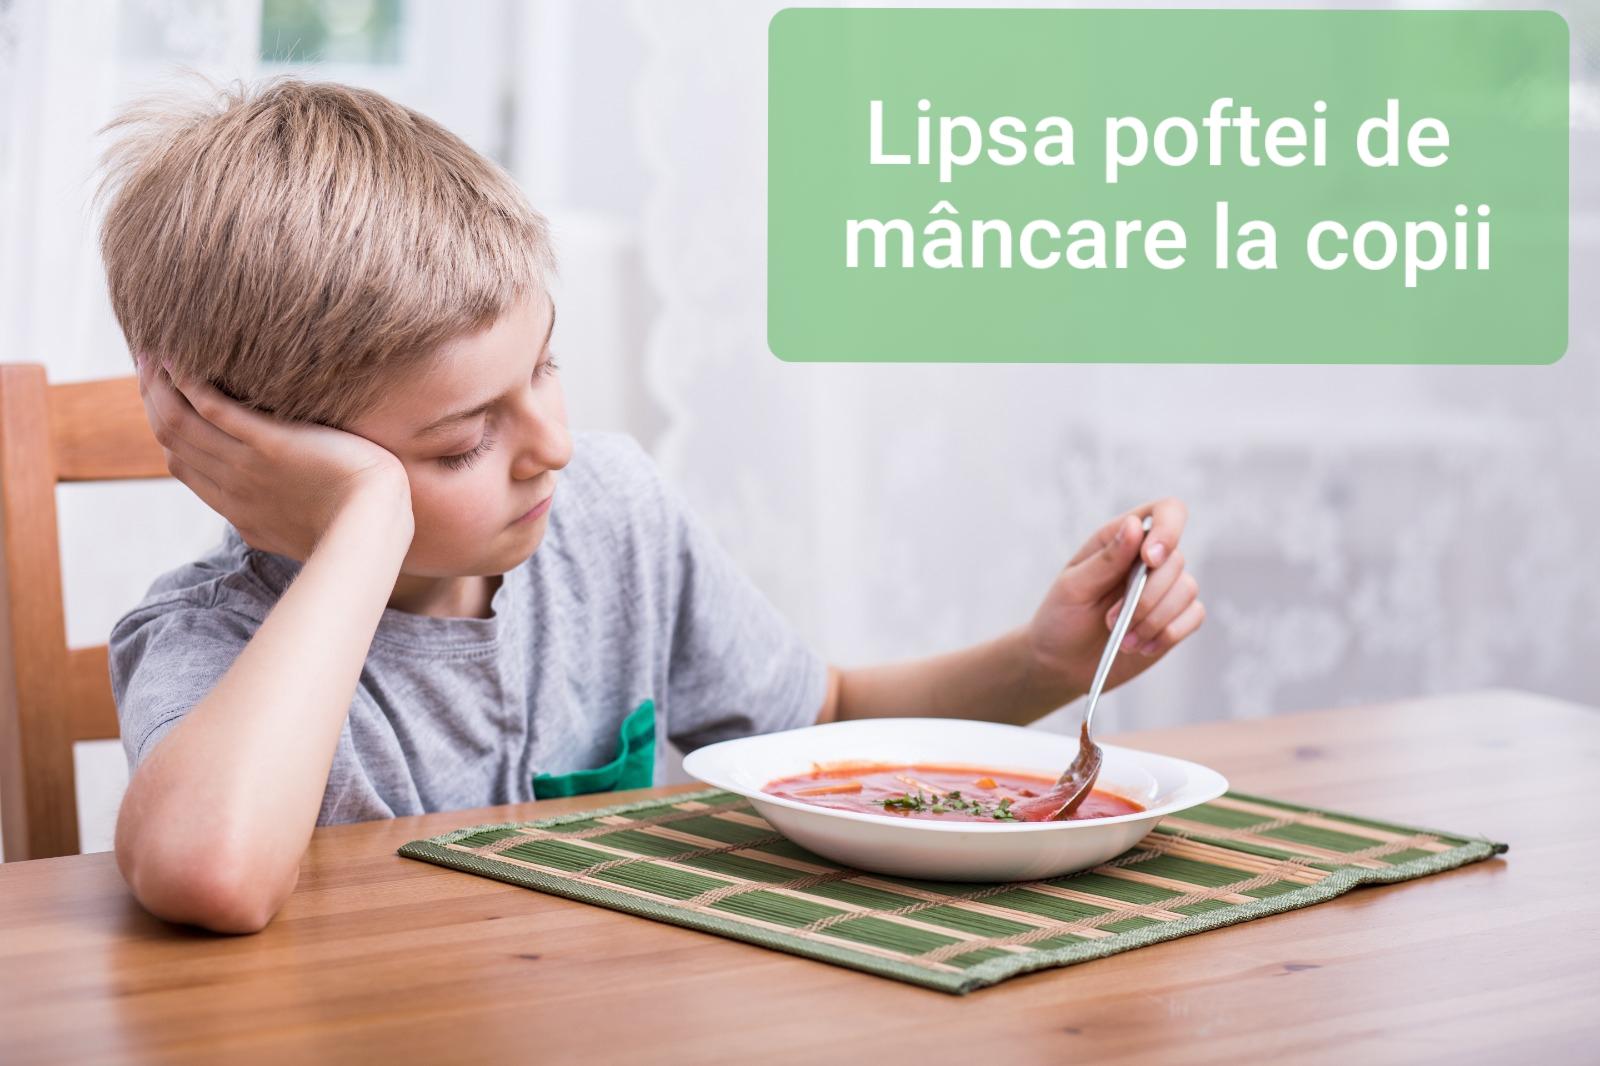 Lipsa Poftei De Mâncare La Copii